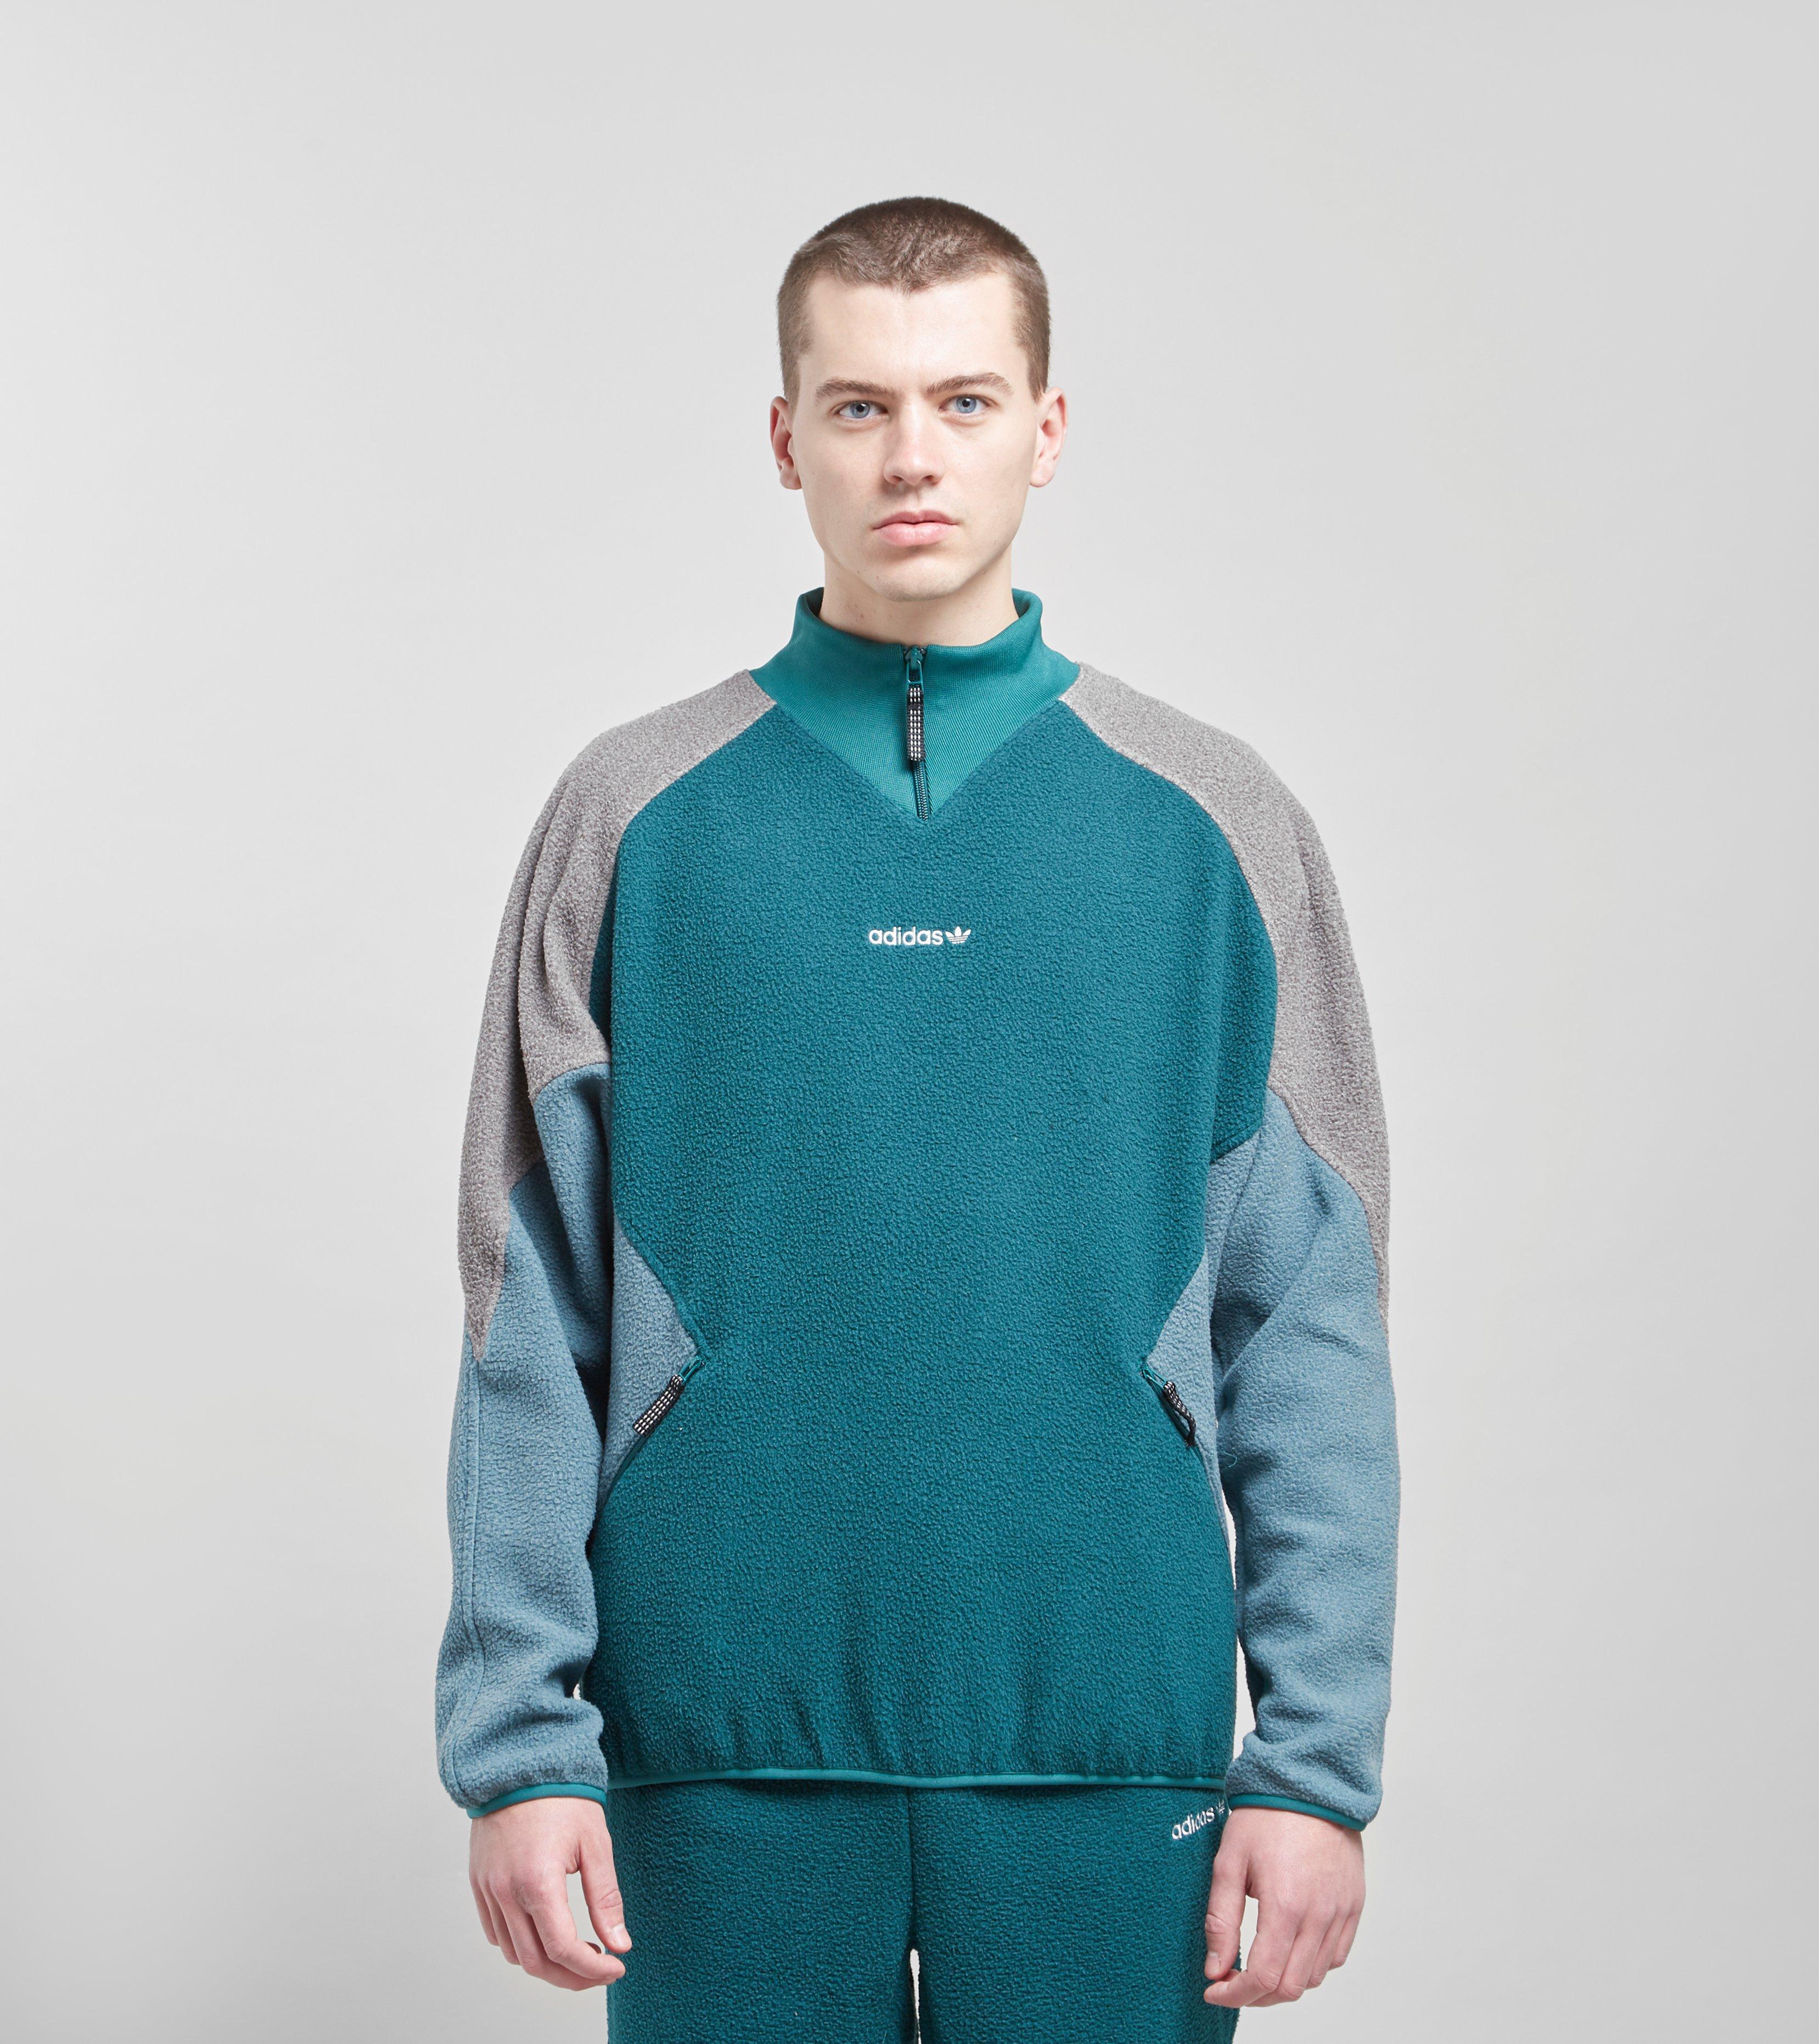 adidas polar fleece originals jacke